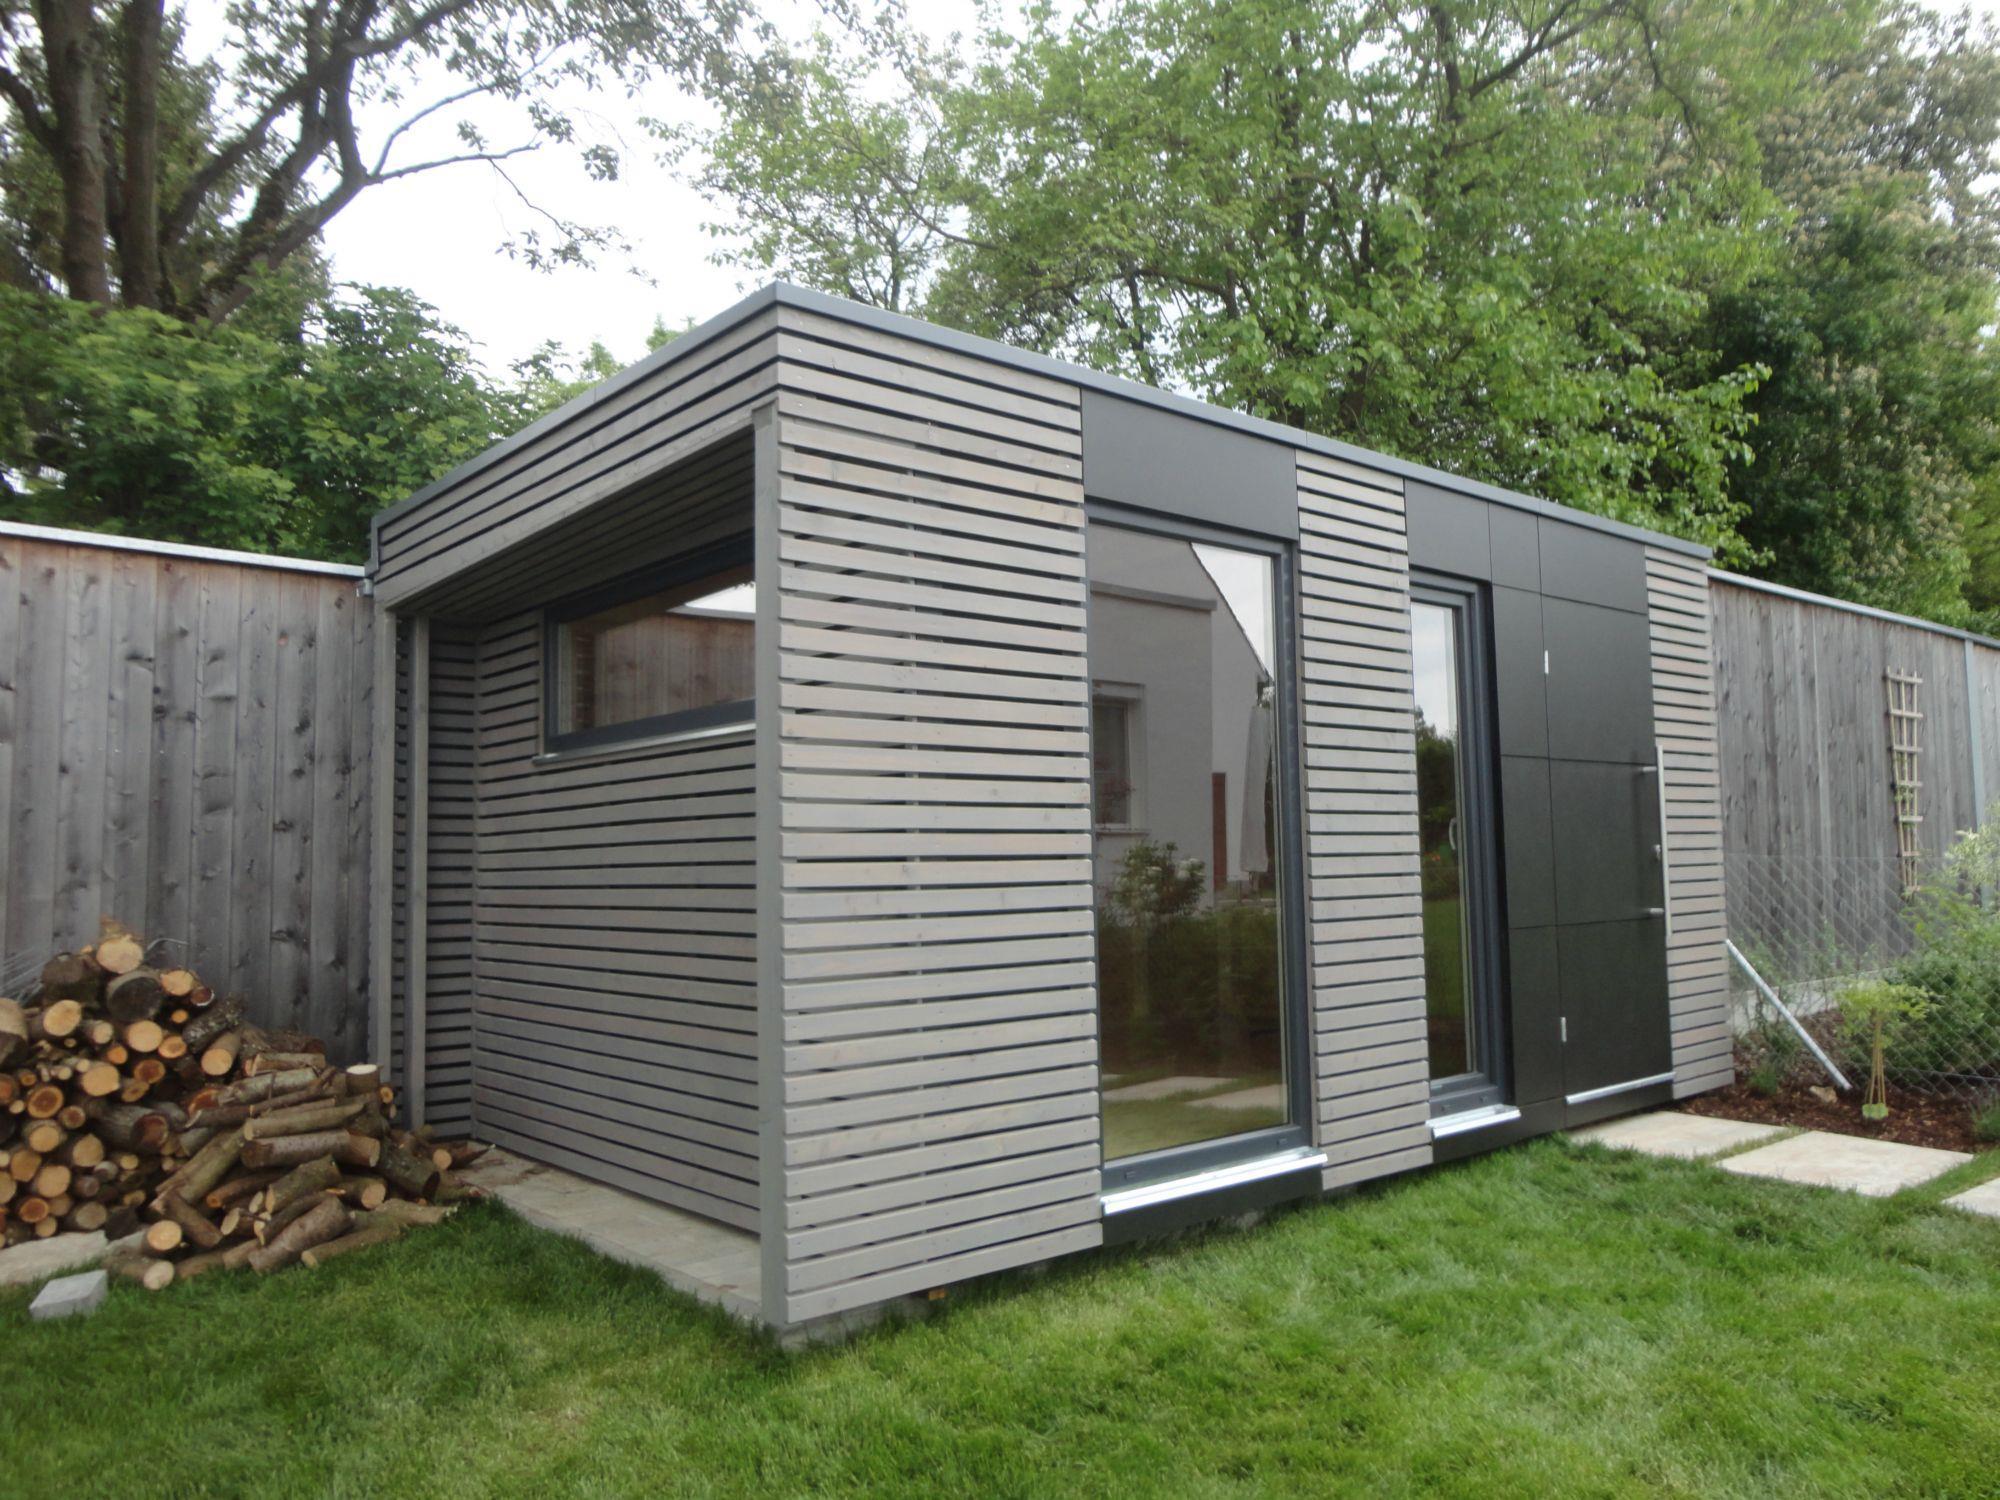 Design Gartenhaus 5x2 5 M Naturhouse S12 Modernes Gartenhaus Mit Flachdach